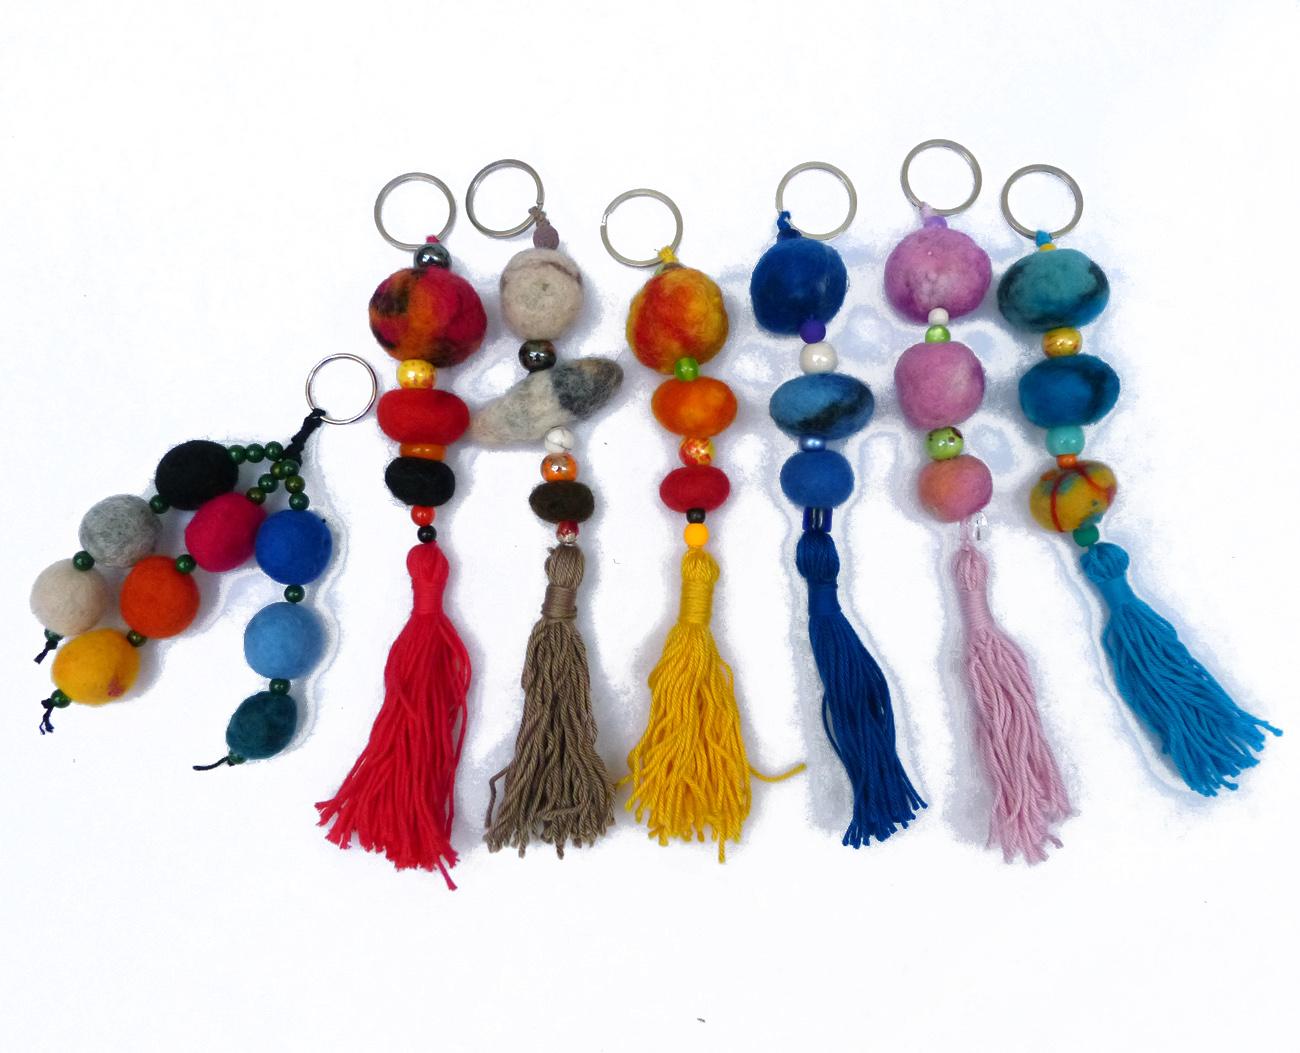 Schlüsselanhänger mit Filzperlen